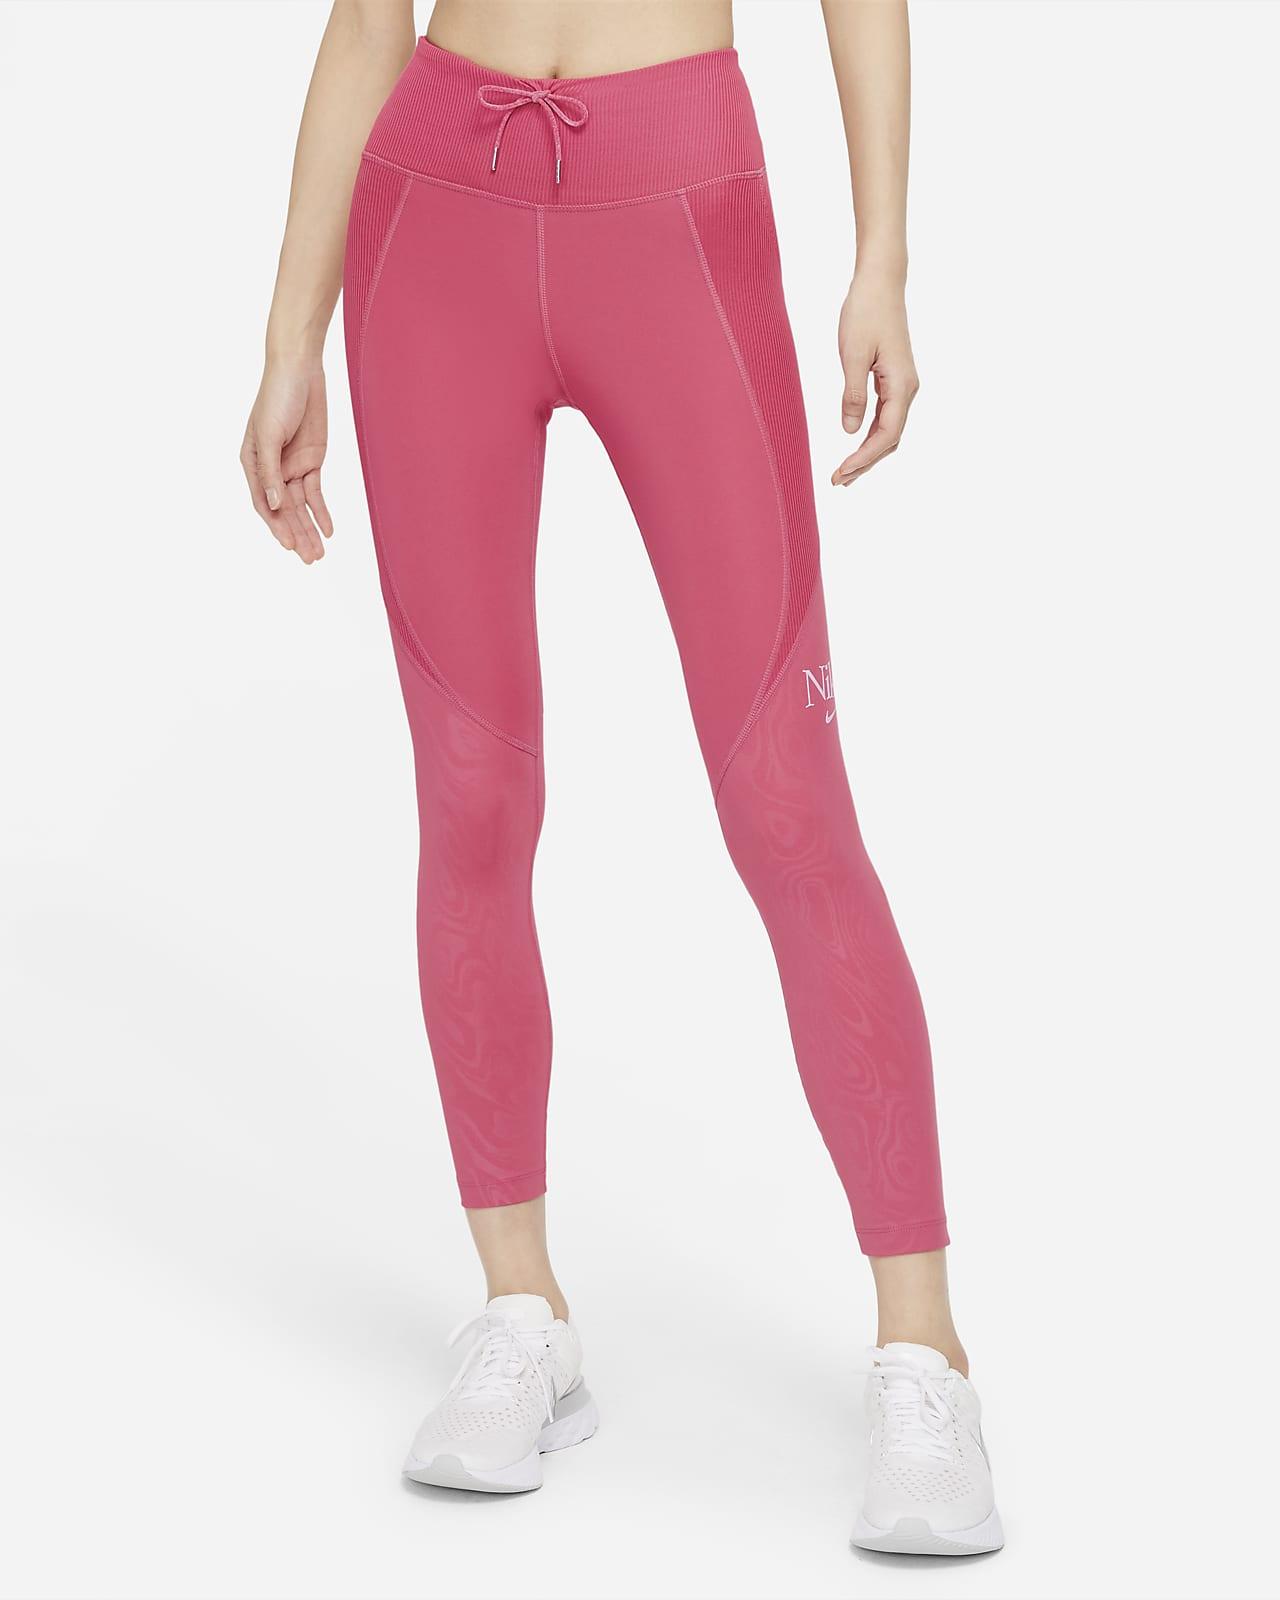 Legging de running 7/8 Nike Dri-FIT Femme Fast pour Femme